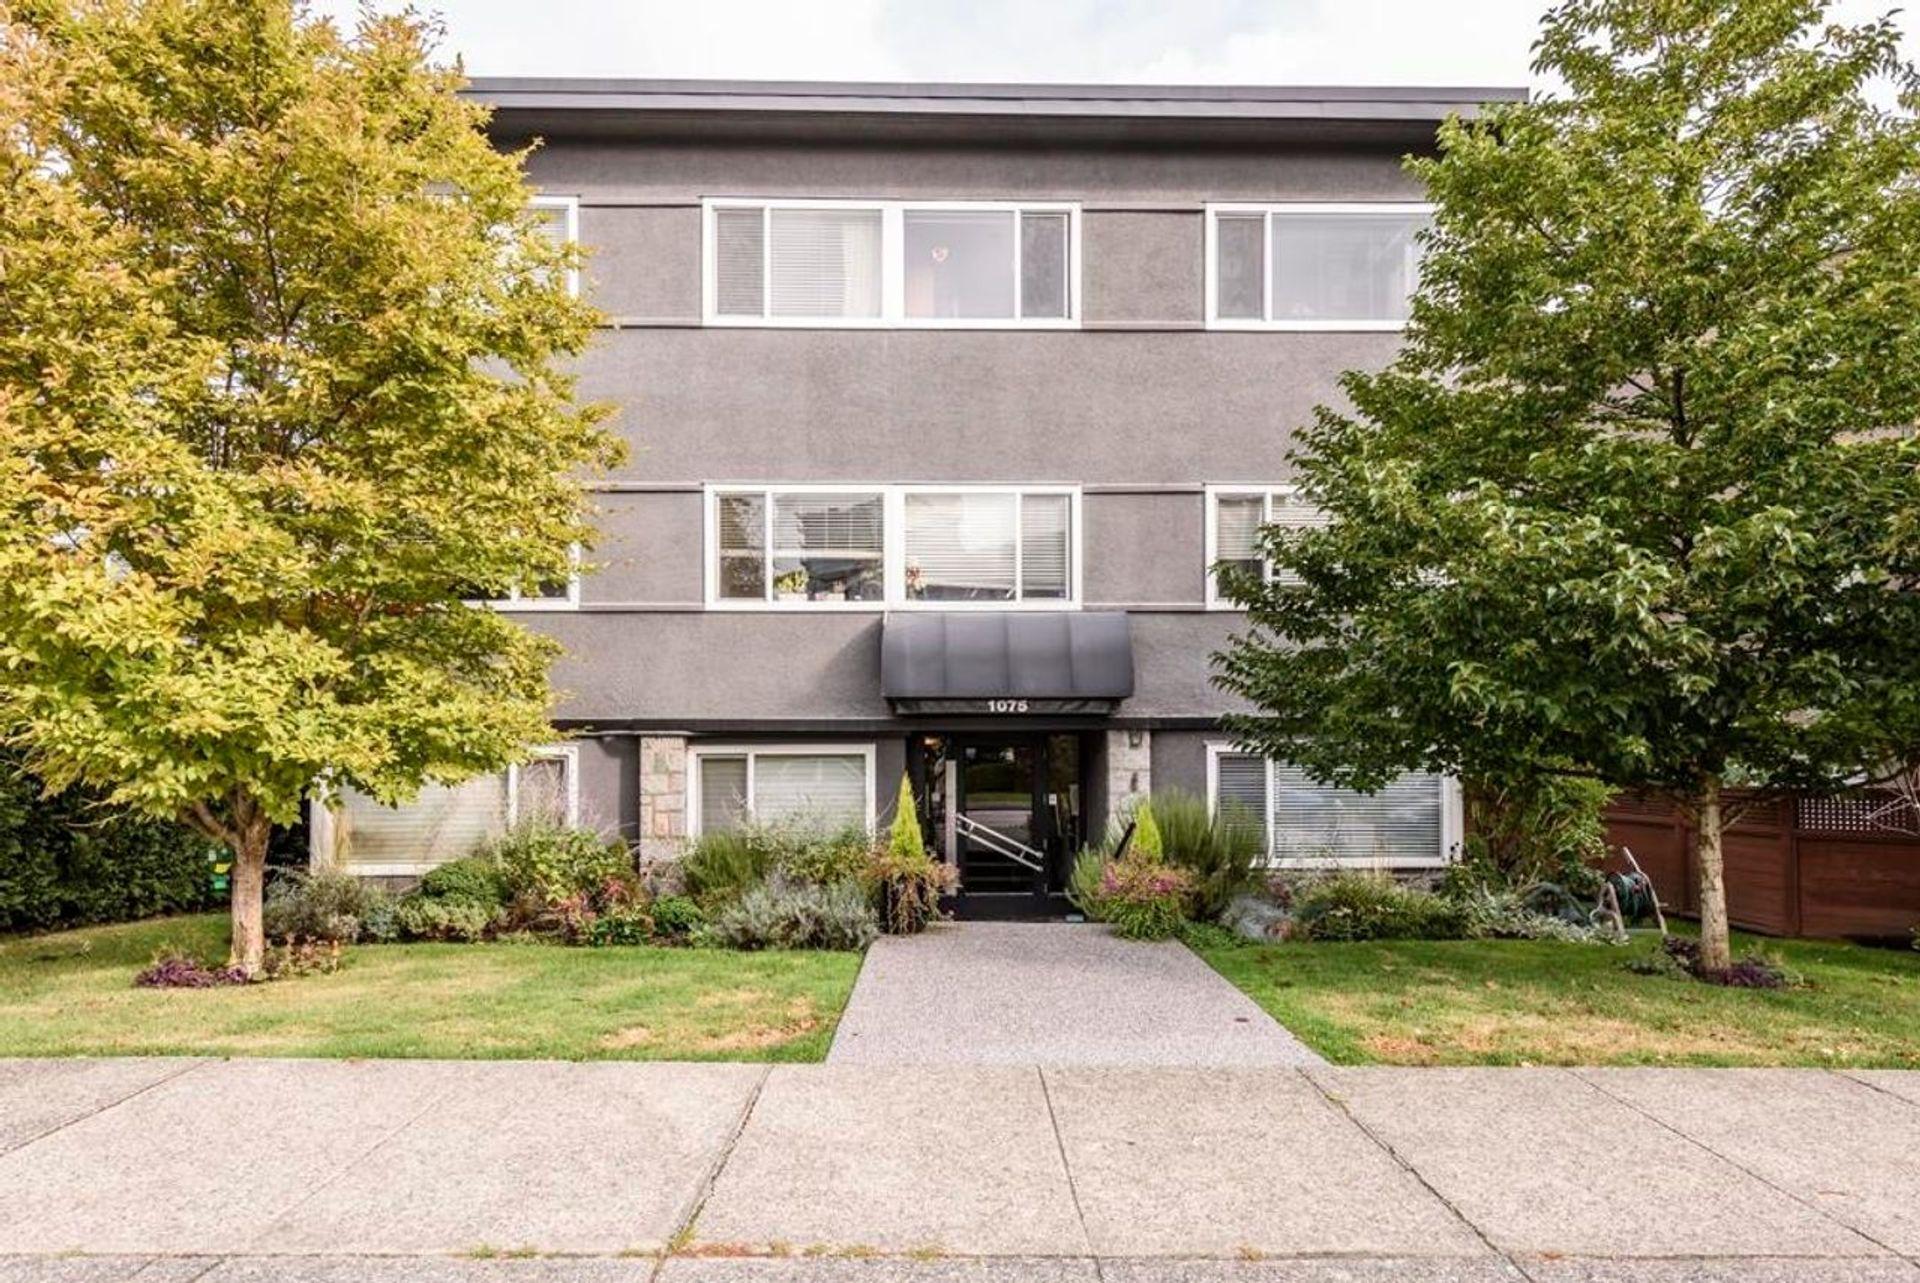 2 - 1075 West 13th Avenue, Fairview VW, Vancouver West photo number 1